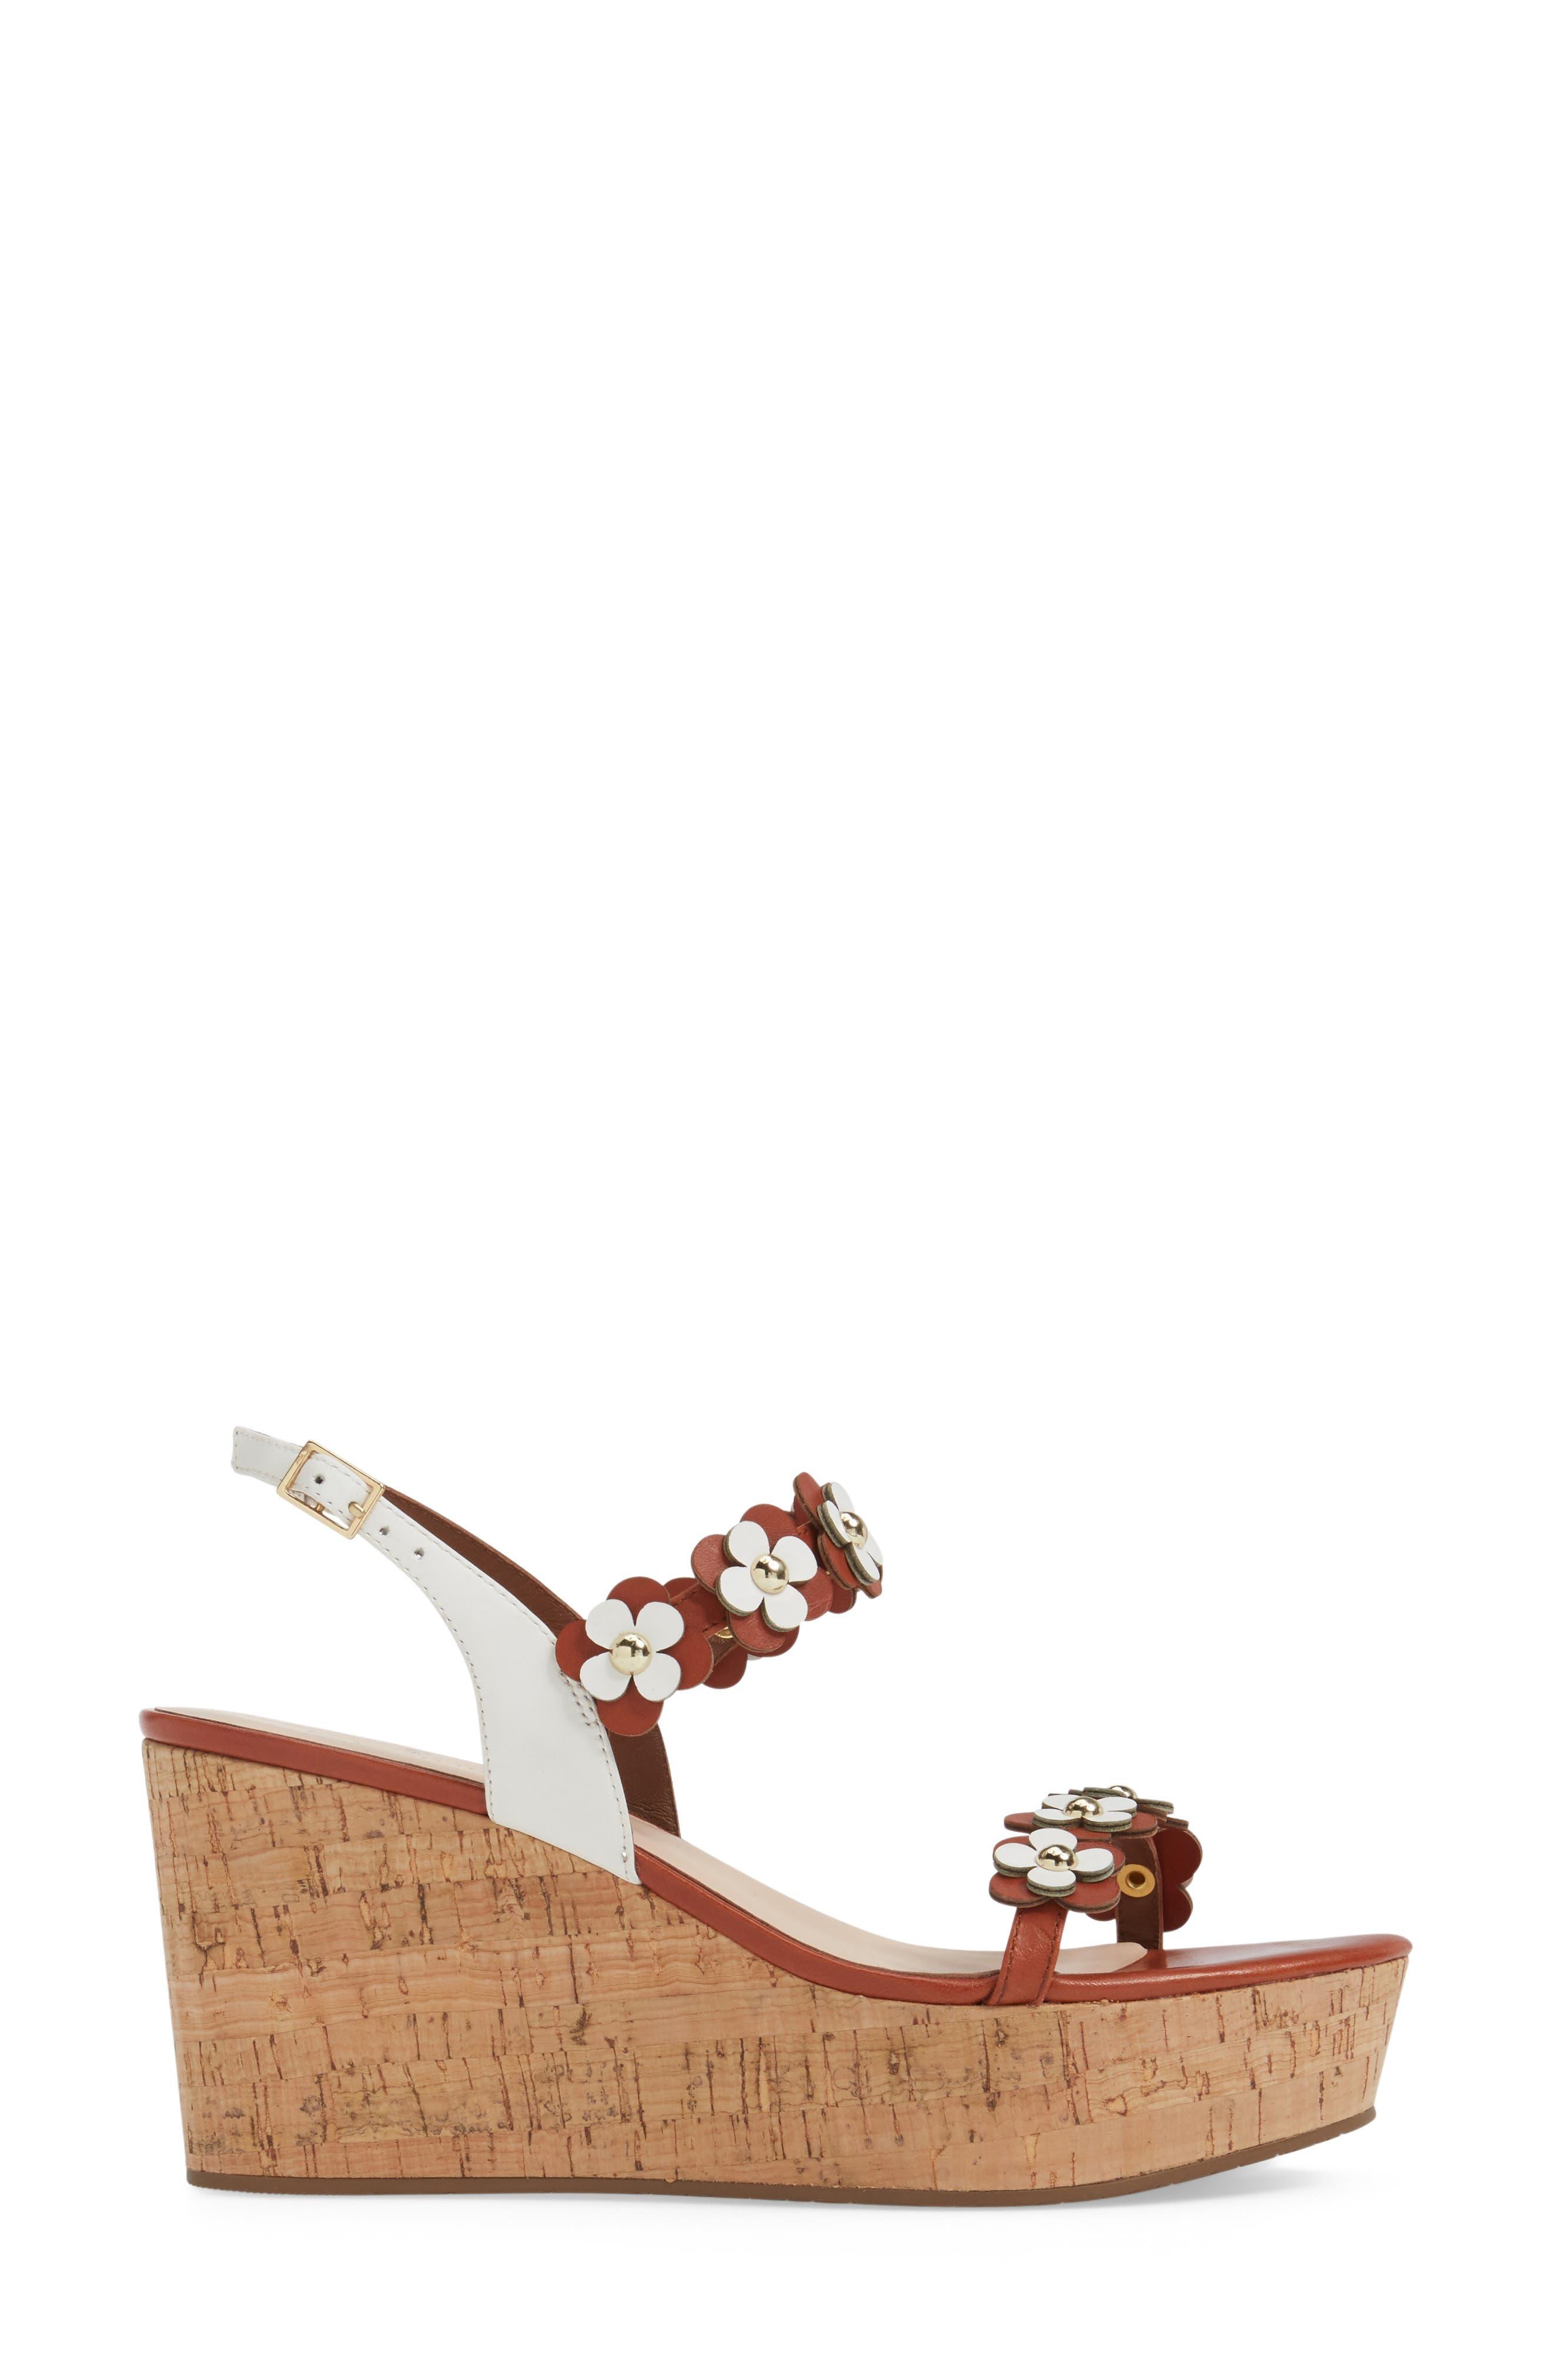 KATE SPADE NEW YORK, tisdale platform wedge sandal, Alternate thumbnail 3, color, 200